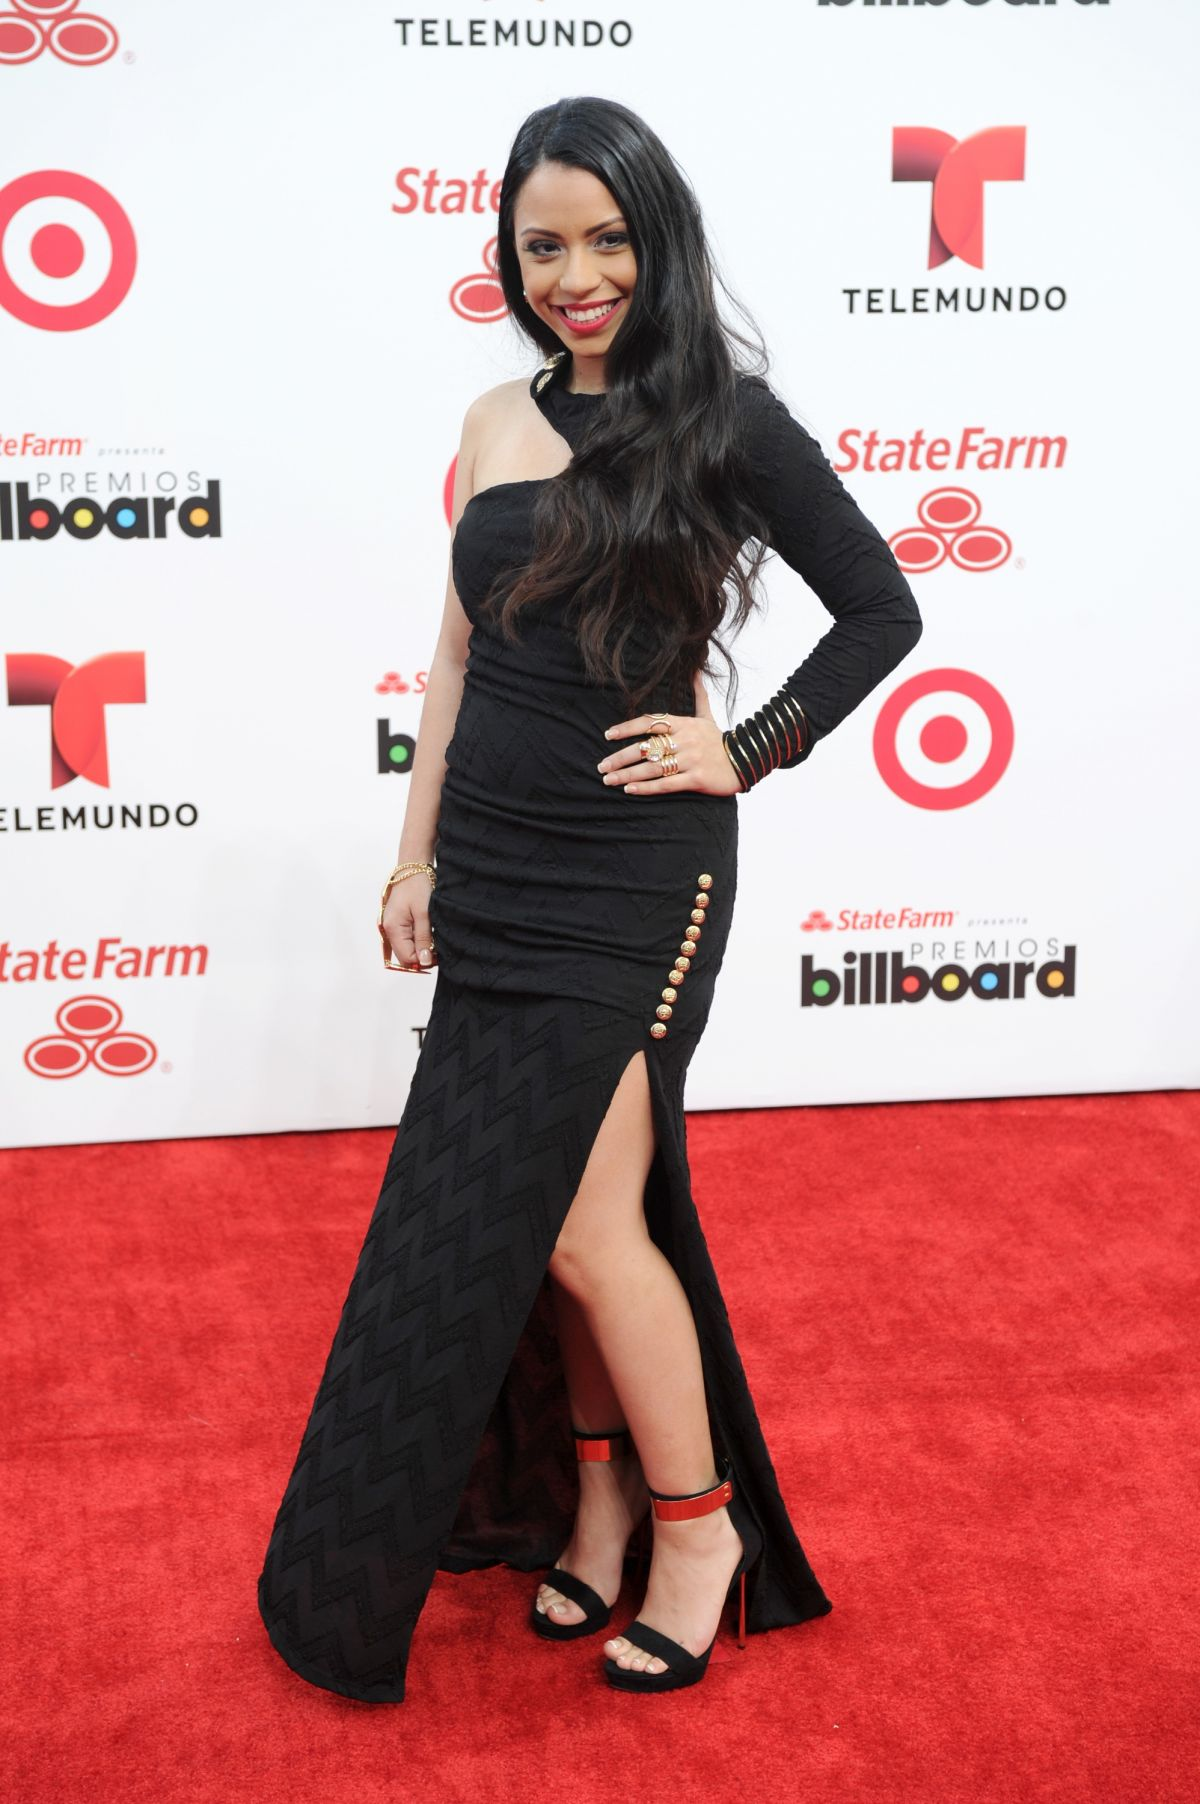 ELI JAS at 2014 Billboard Latin Music Awards in Miami